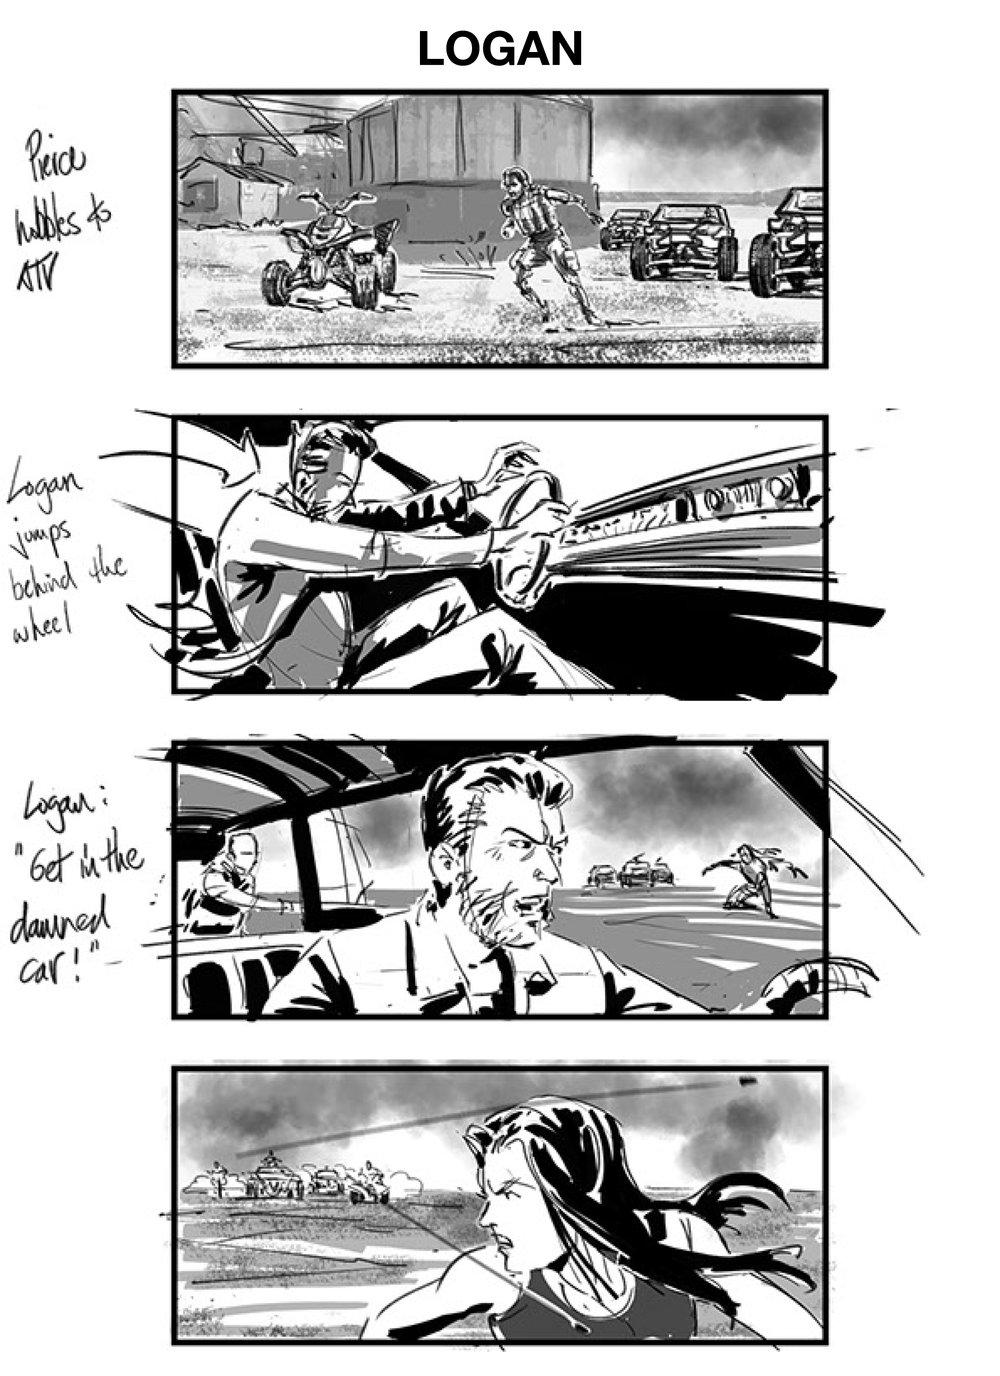 Logan web-07.jpg